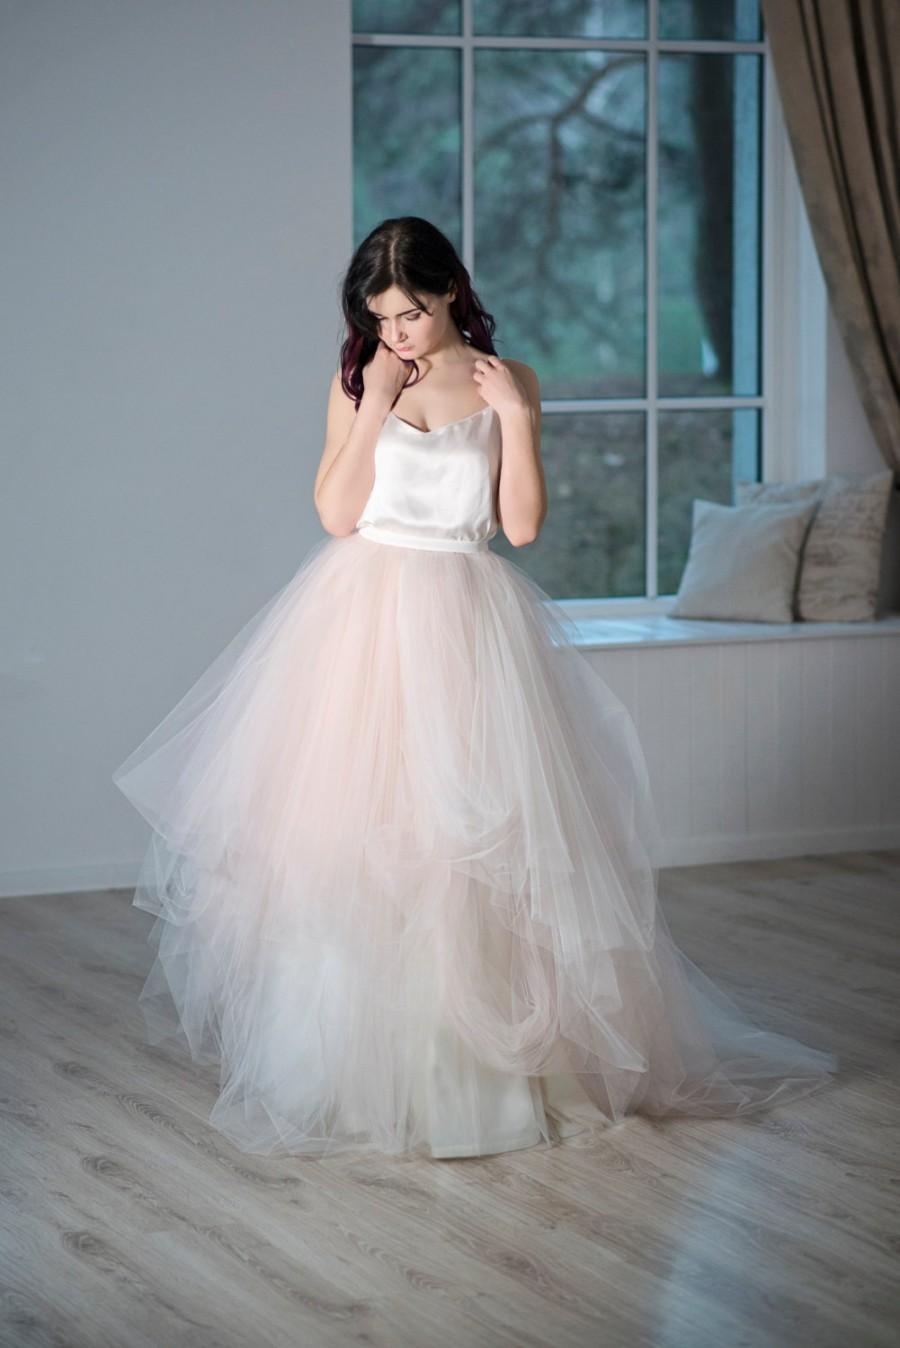 Wedding - Magnolia - tulle wedding skirt / bridal tulle skirt / blush bridal  skirt / whimsical bridal skirt / tulle skirt bridal